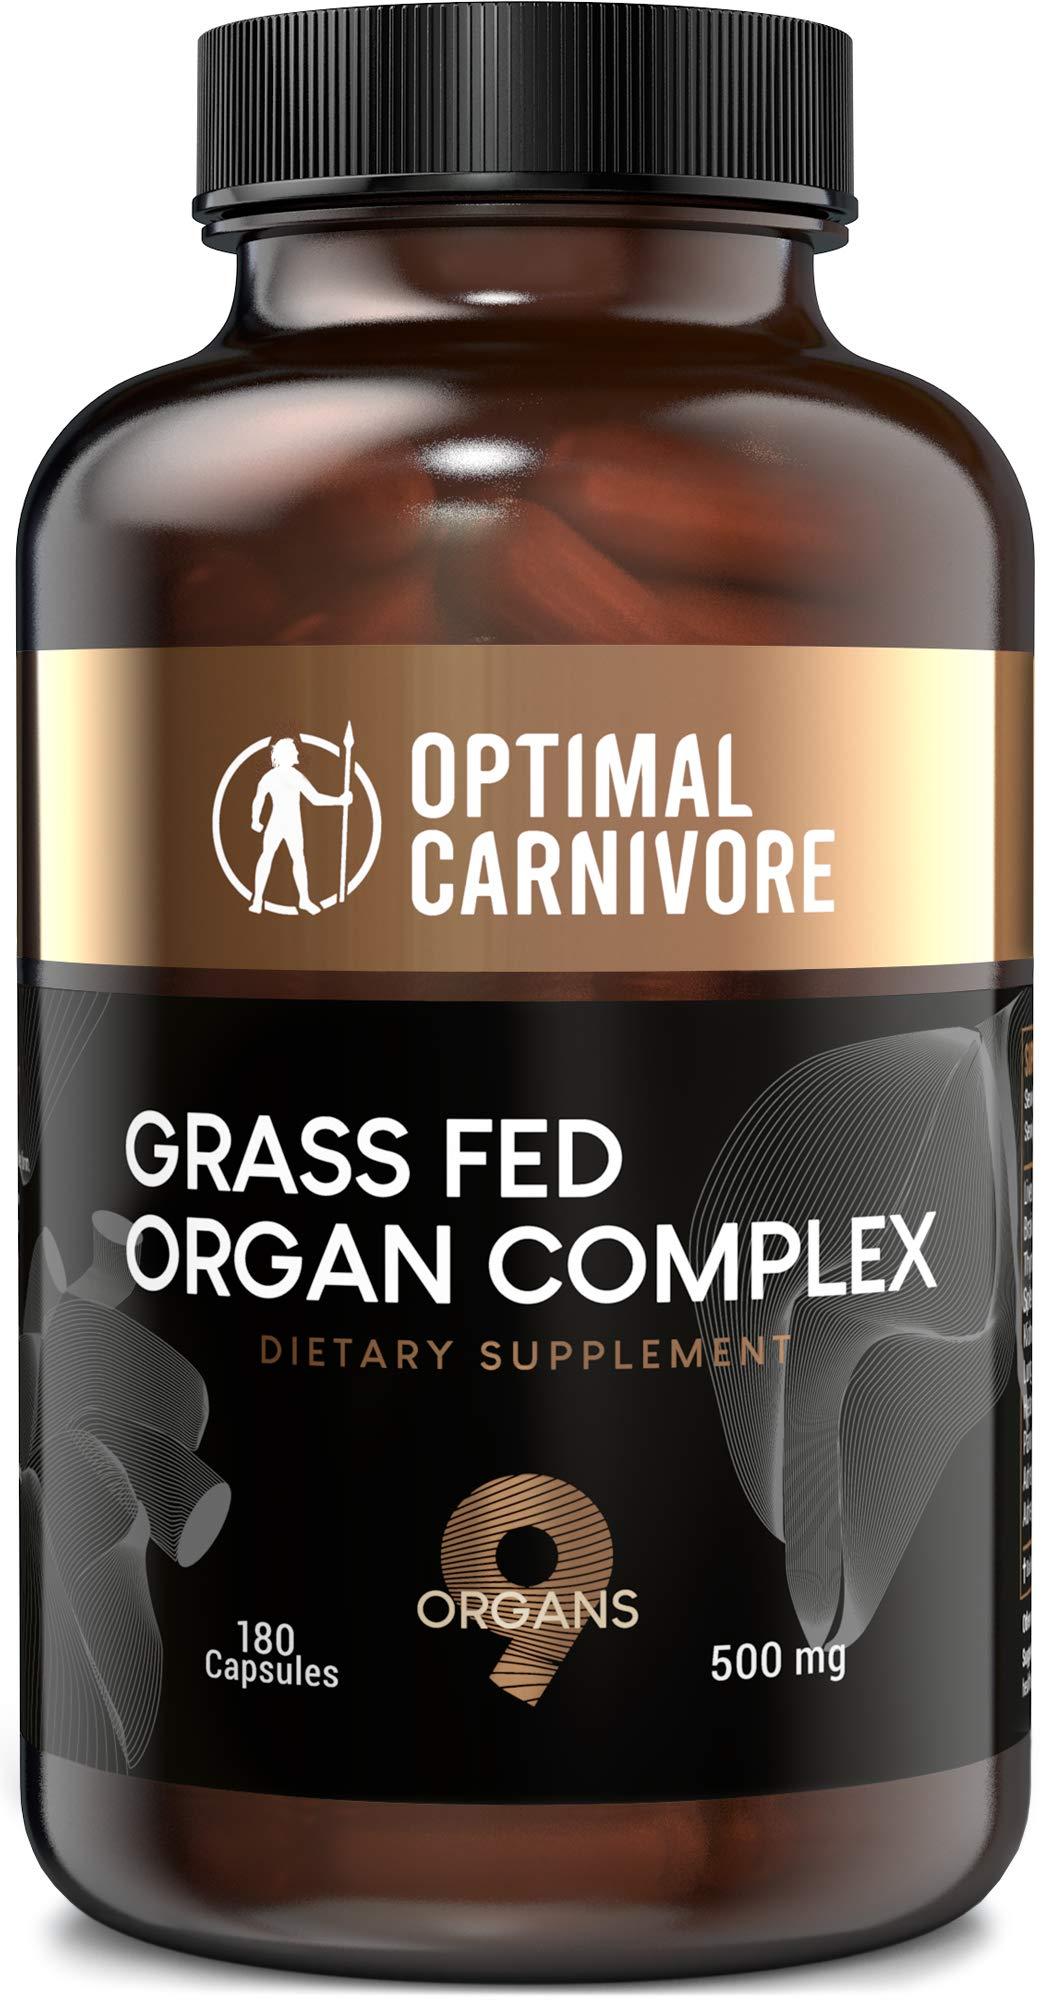 Grass Fed Organ Complex, Desiccated Beef Organs - Beef Liver, Brain, Heart, Thymus, Kidney, Spleen, Pancreas, Lung & Adrenals, Ancestral Formula (180 Capsules) by Optimal Carnivore by Optimal Carnivore